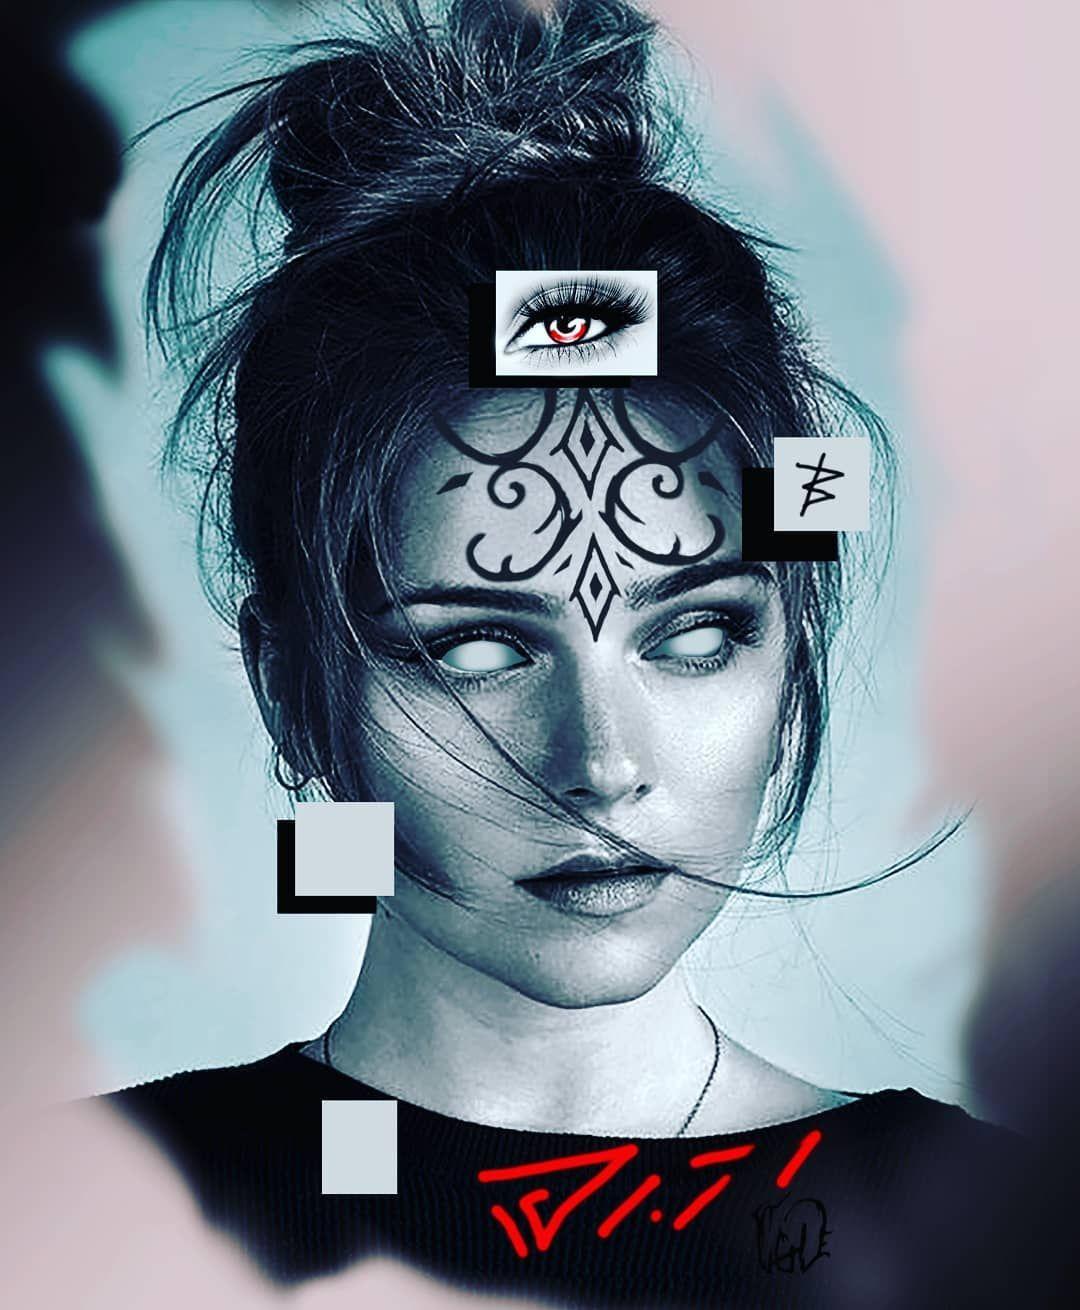 Эскиз @vlad_tattoo116  #suprasorbf #teamsuprasorbf #супрасорбф #супрасорб #Тату #Tattoo #Уходпослетату #Suprasorb #татумастер #татуировка #Kazan #Казань #vladtattoo  #tattoofeel_ru #tattoos #tattoorealistic #tattoorealism #tattooed #tattooer #vladislavfilimonov #girl #evil